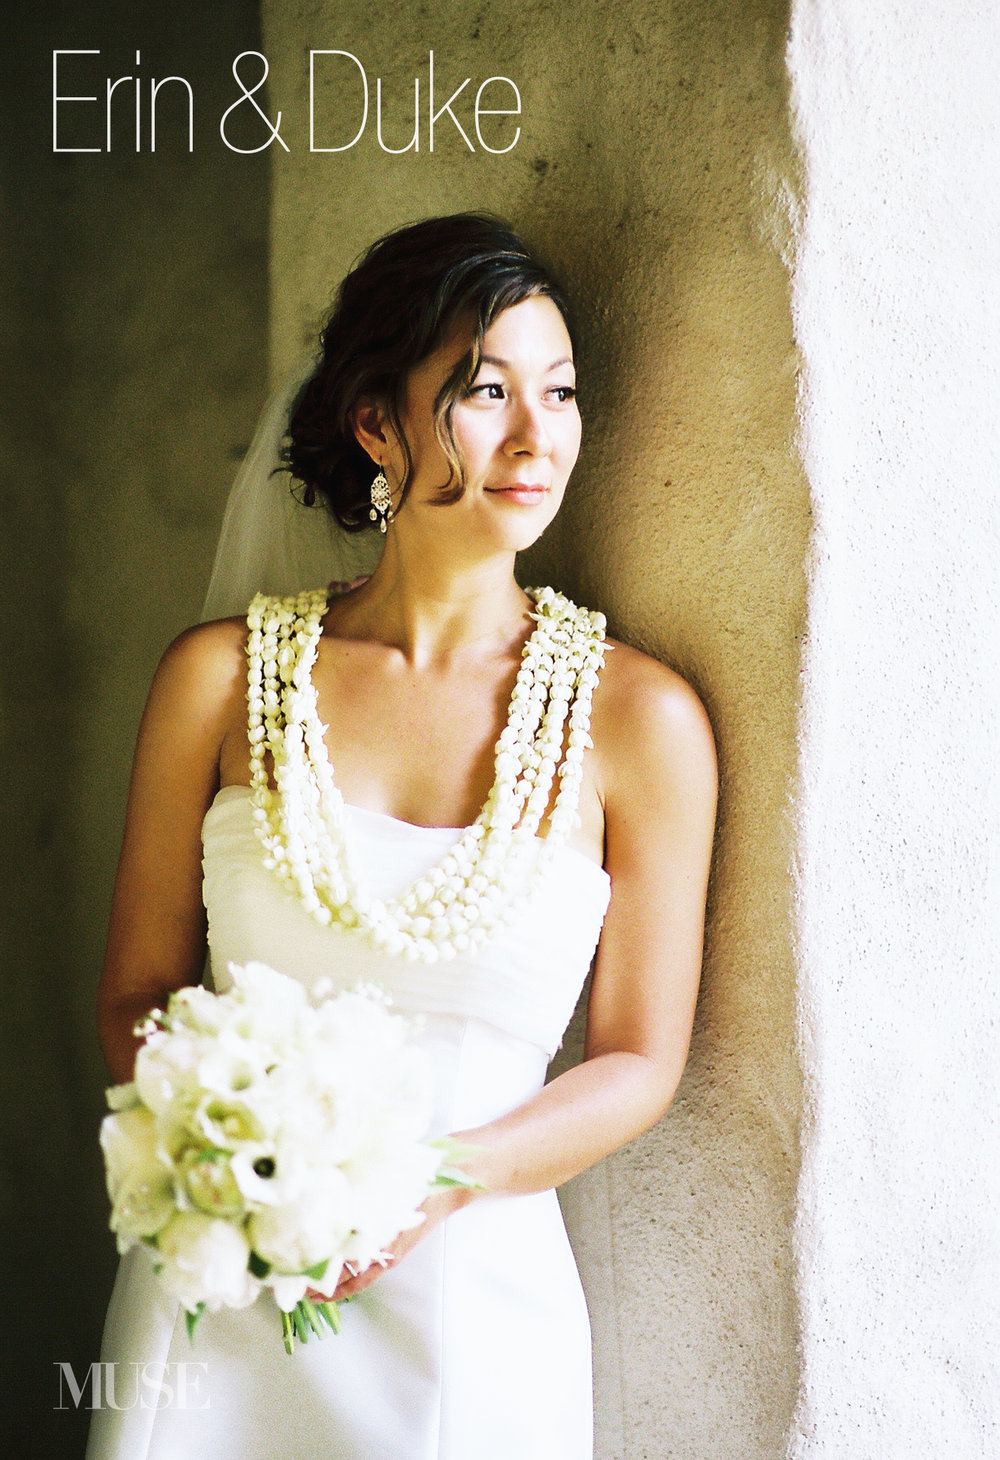 muse-bride-eric-rhodes-top-big-island-hawaii-wedding-photographer-17.jpg